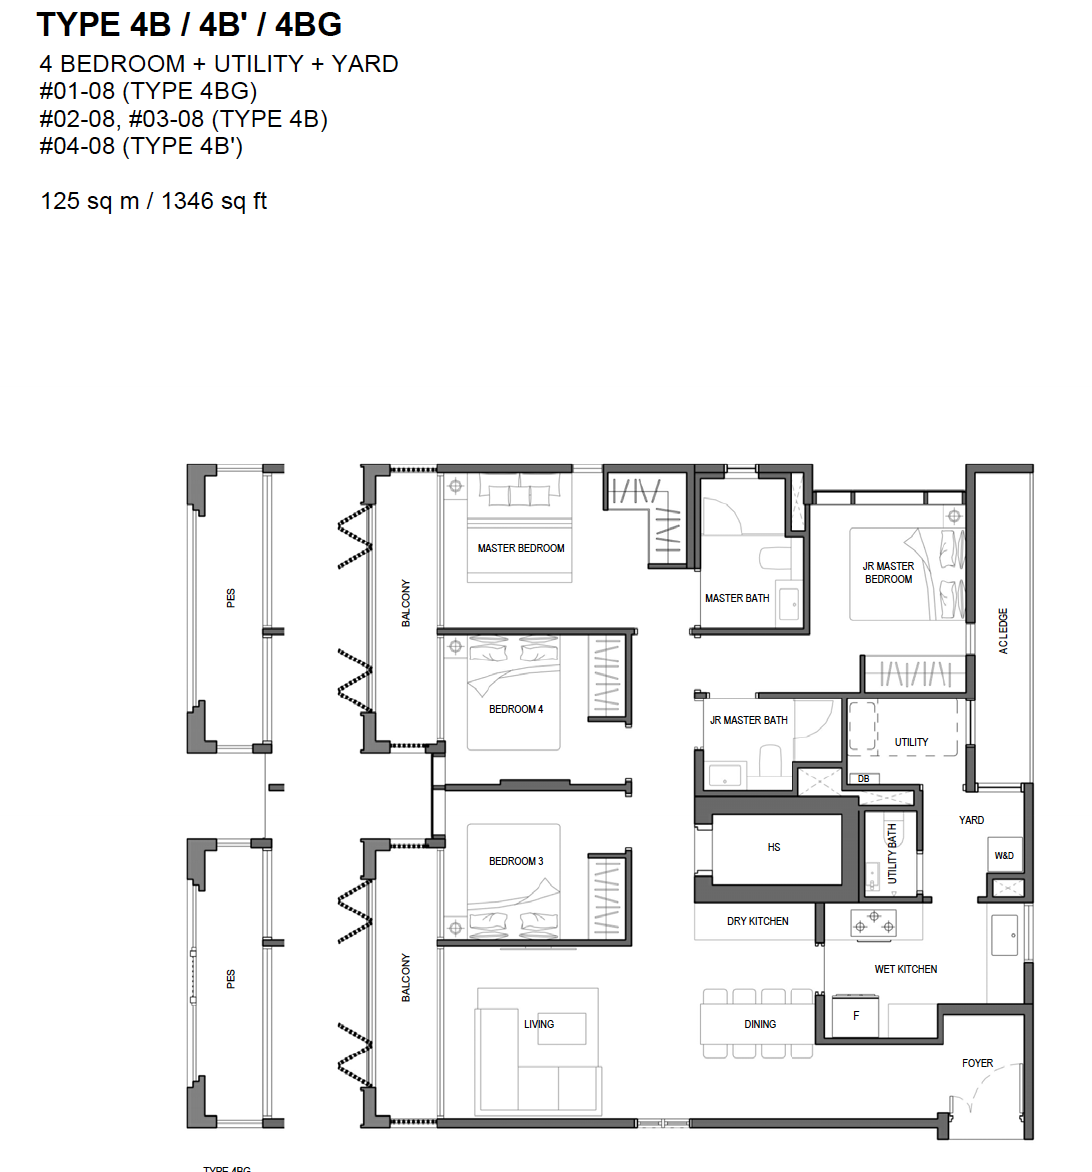 Olloi floor plan - 4 bedroom type 4B